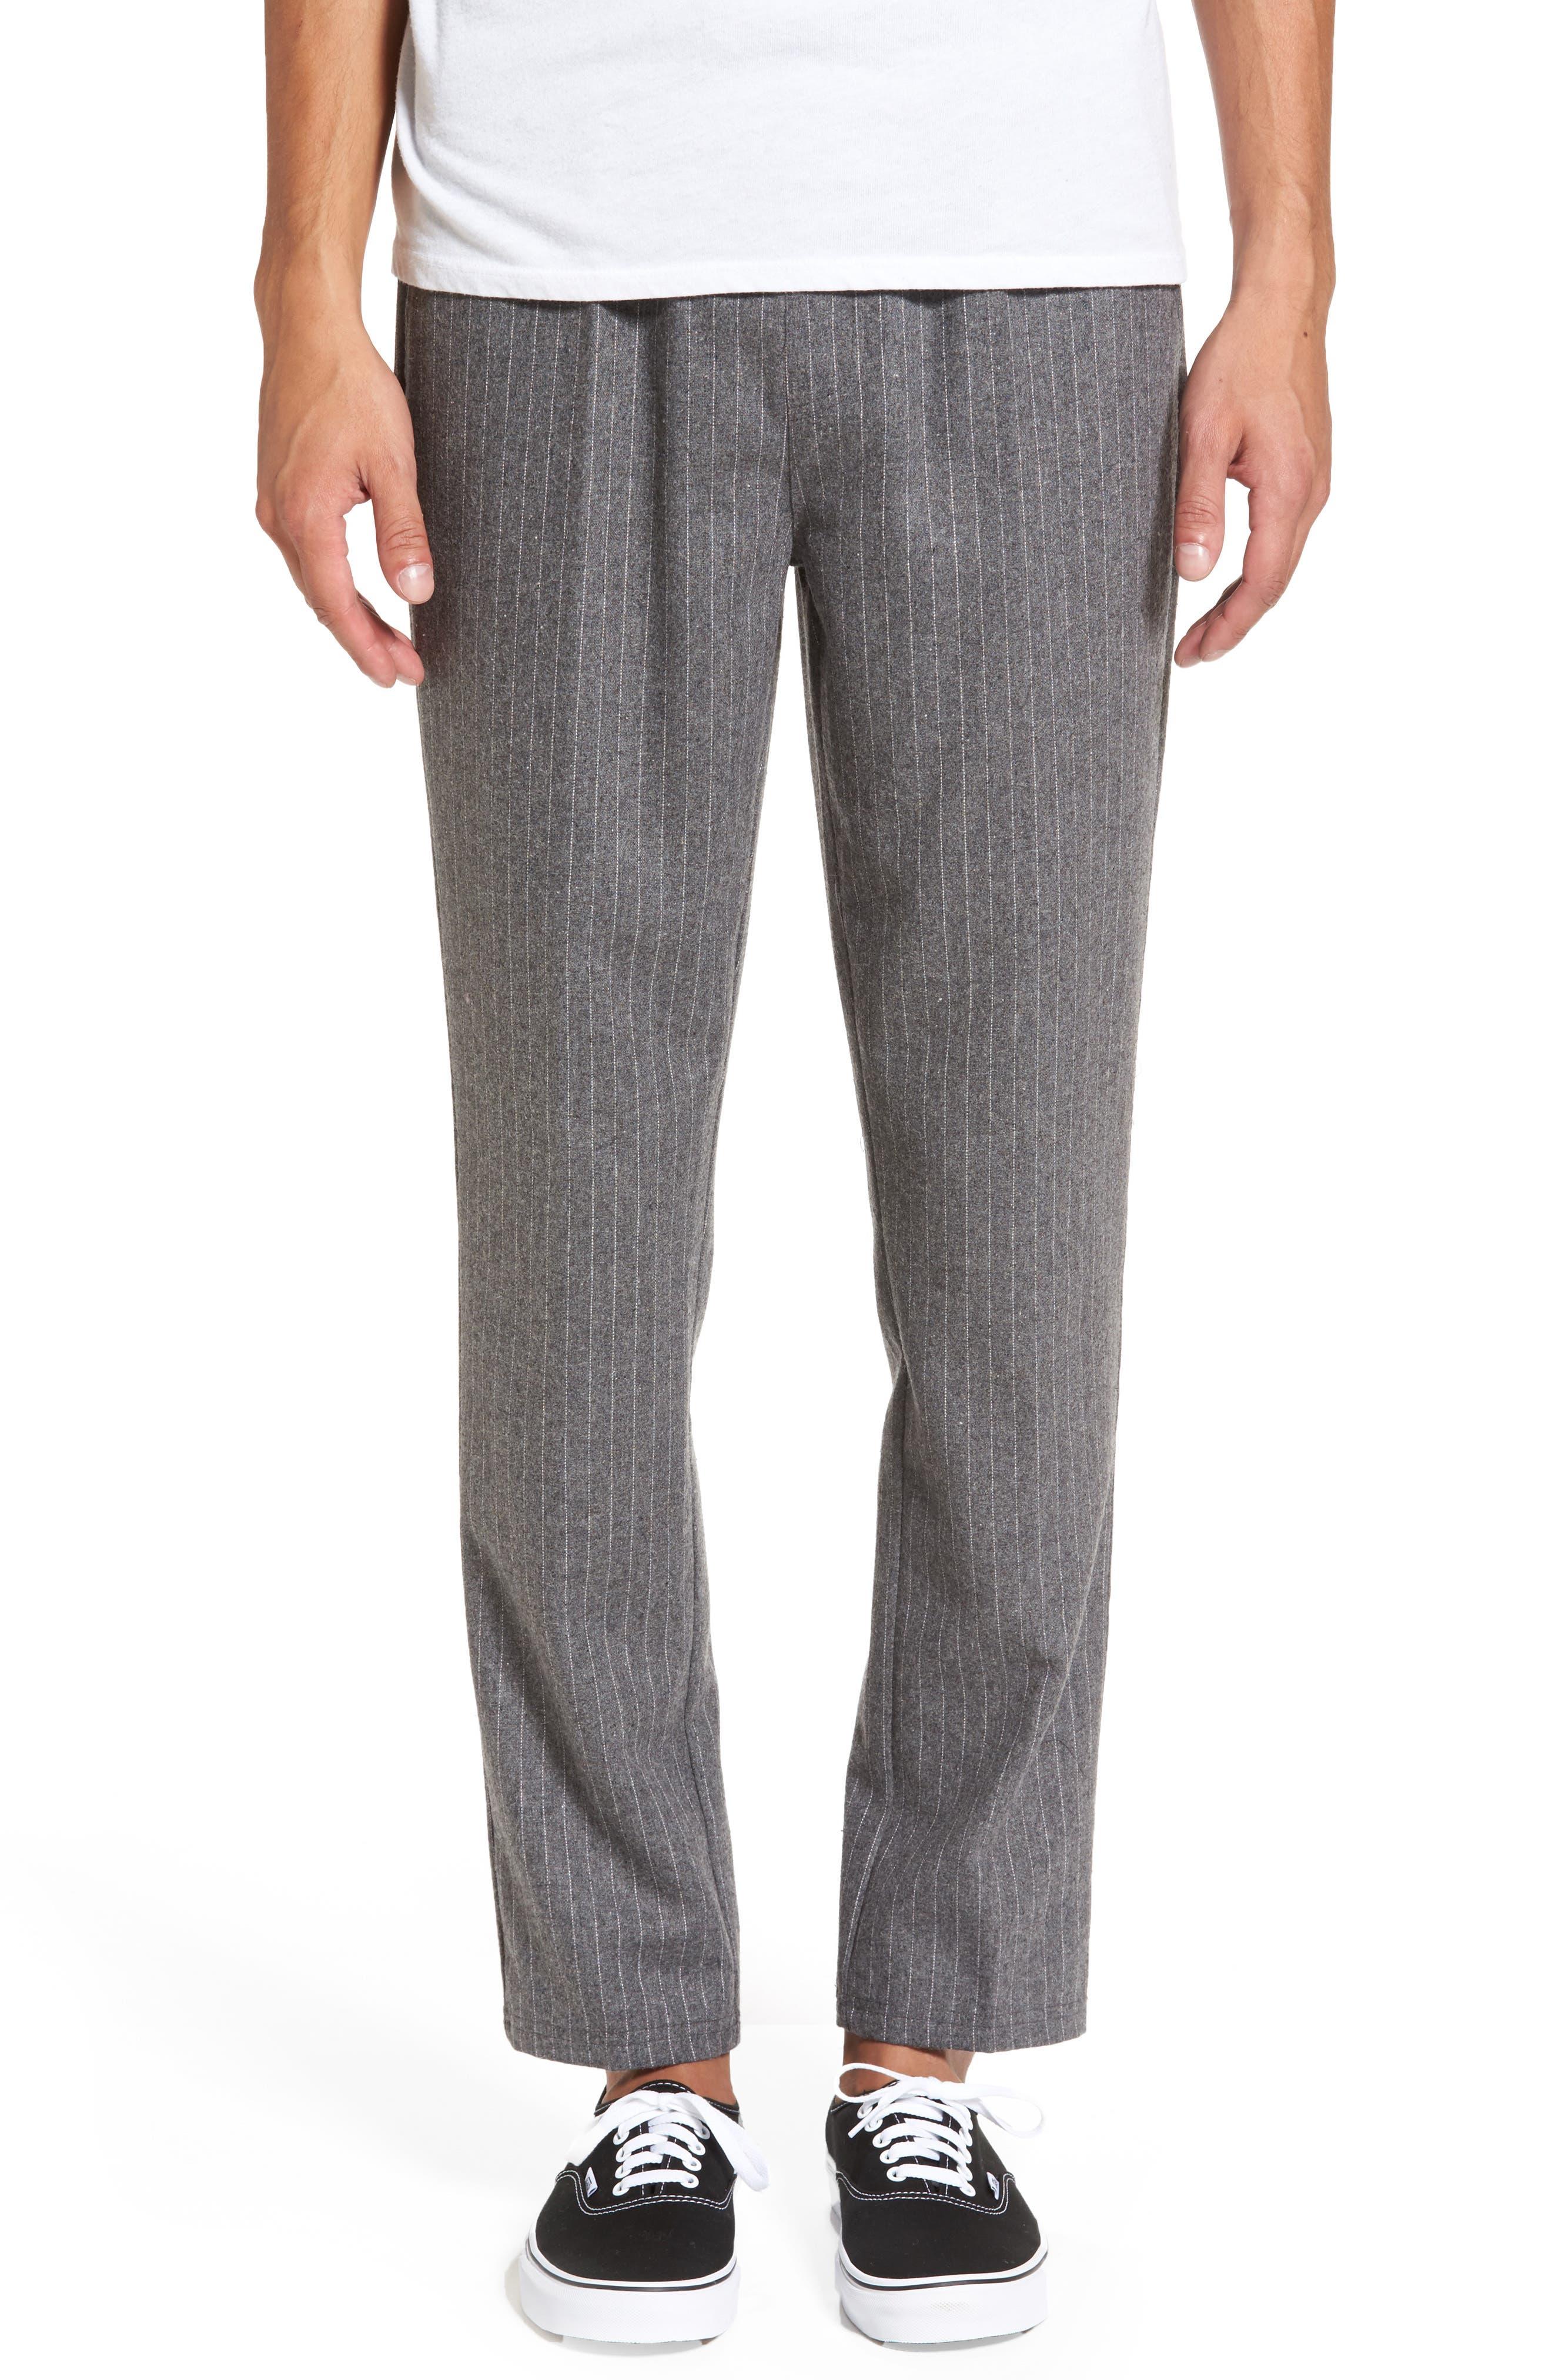 Pennyworth Pants,                         Main,                         color, Charcoal Pinstripe